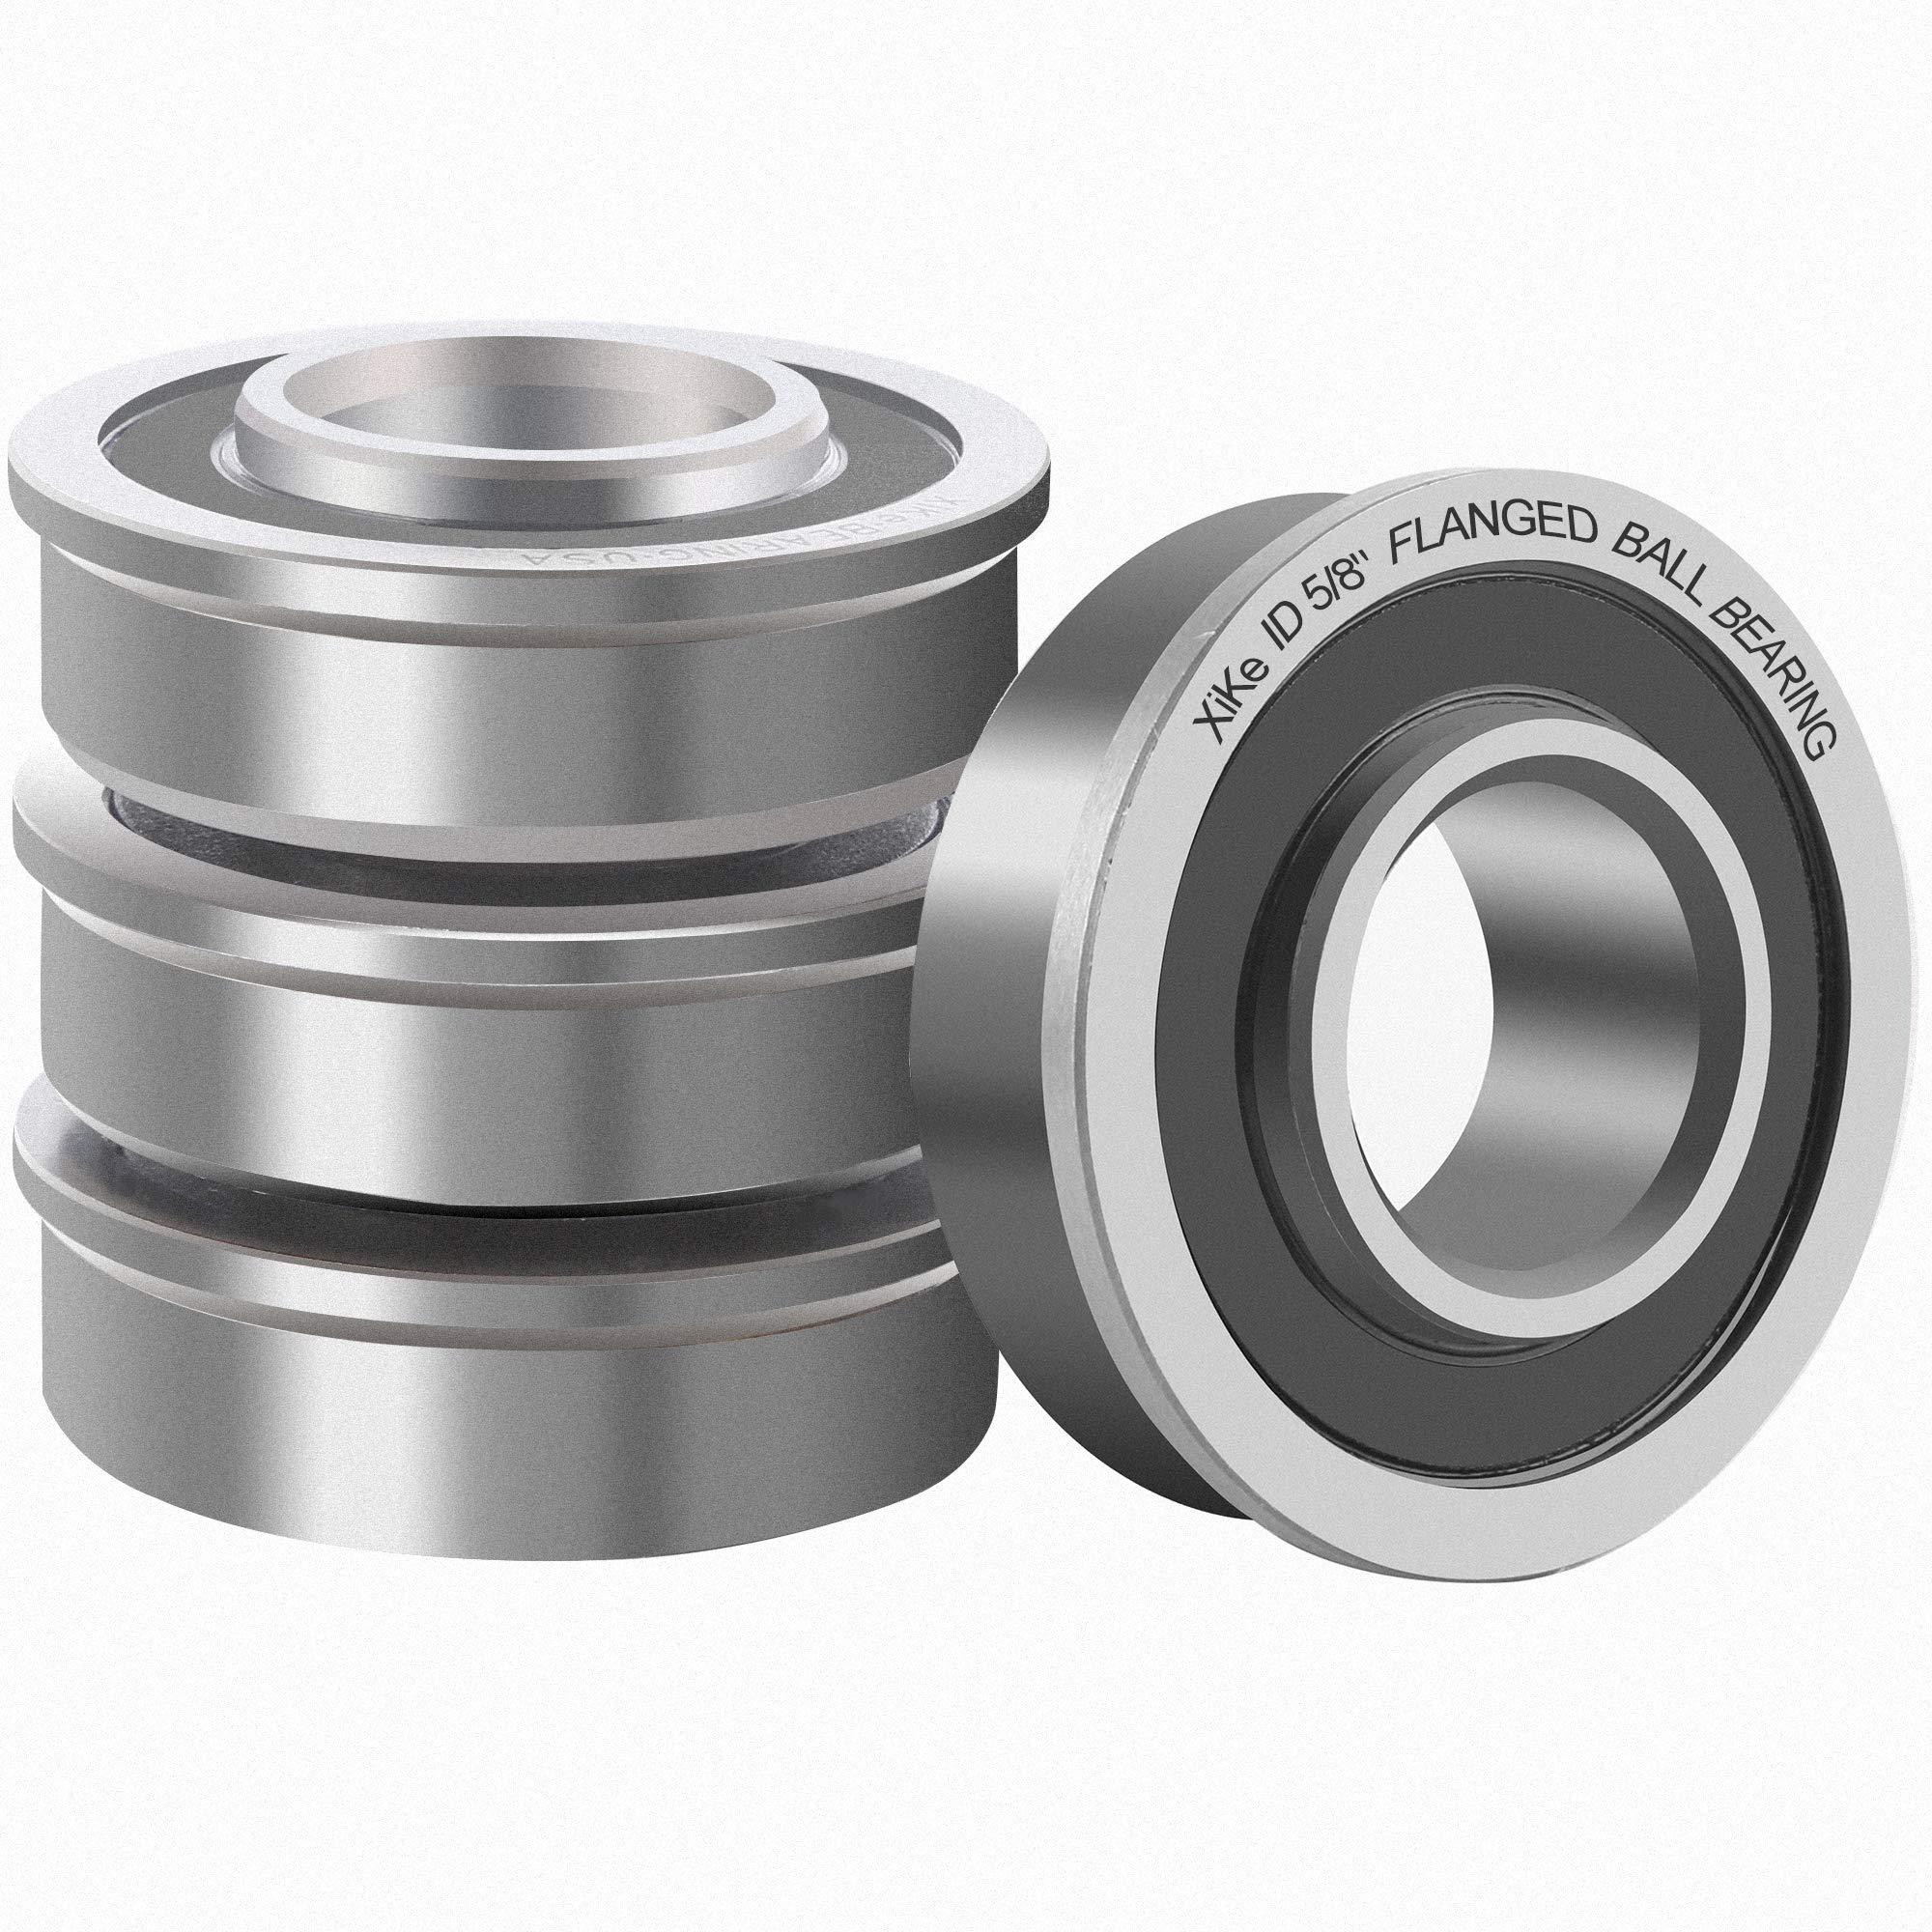 Sunbelt Prime Line Exmark Carts /& Hand Trucks Wheel Hub Replacement Part Compatible for Marathon Stens 8 PCS Flanged Ball Bearings ID 1//2 x OD 1-3//8 for Lawn Mower Wheelbarrows Generators